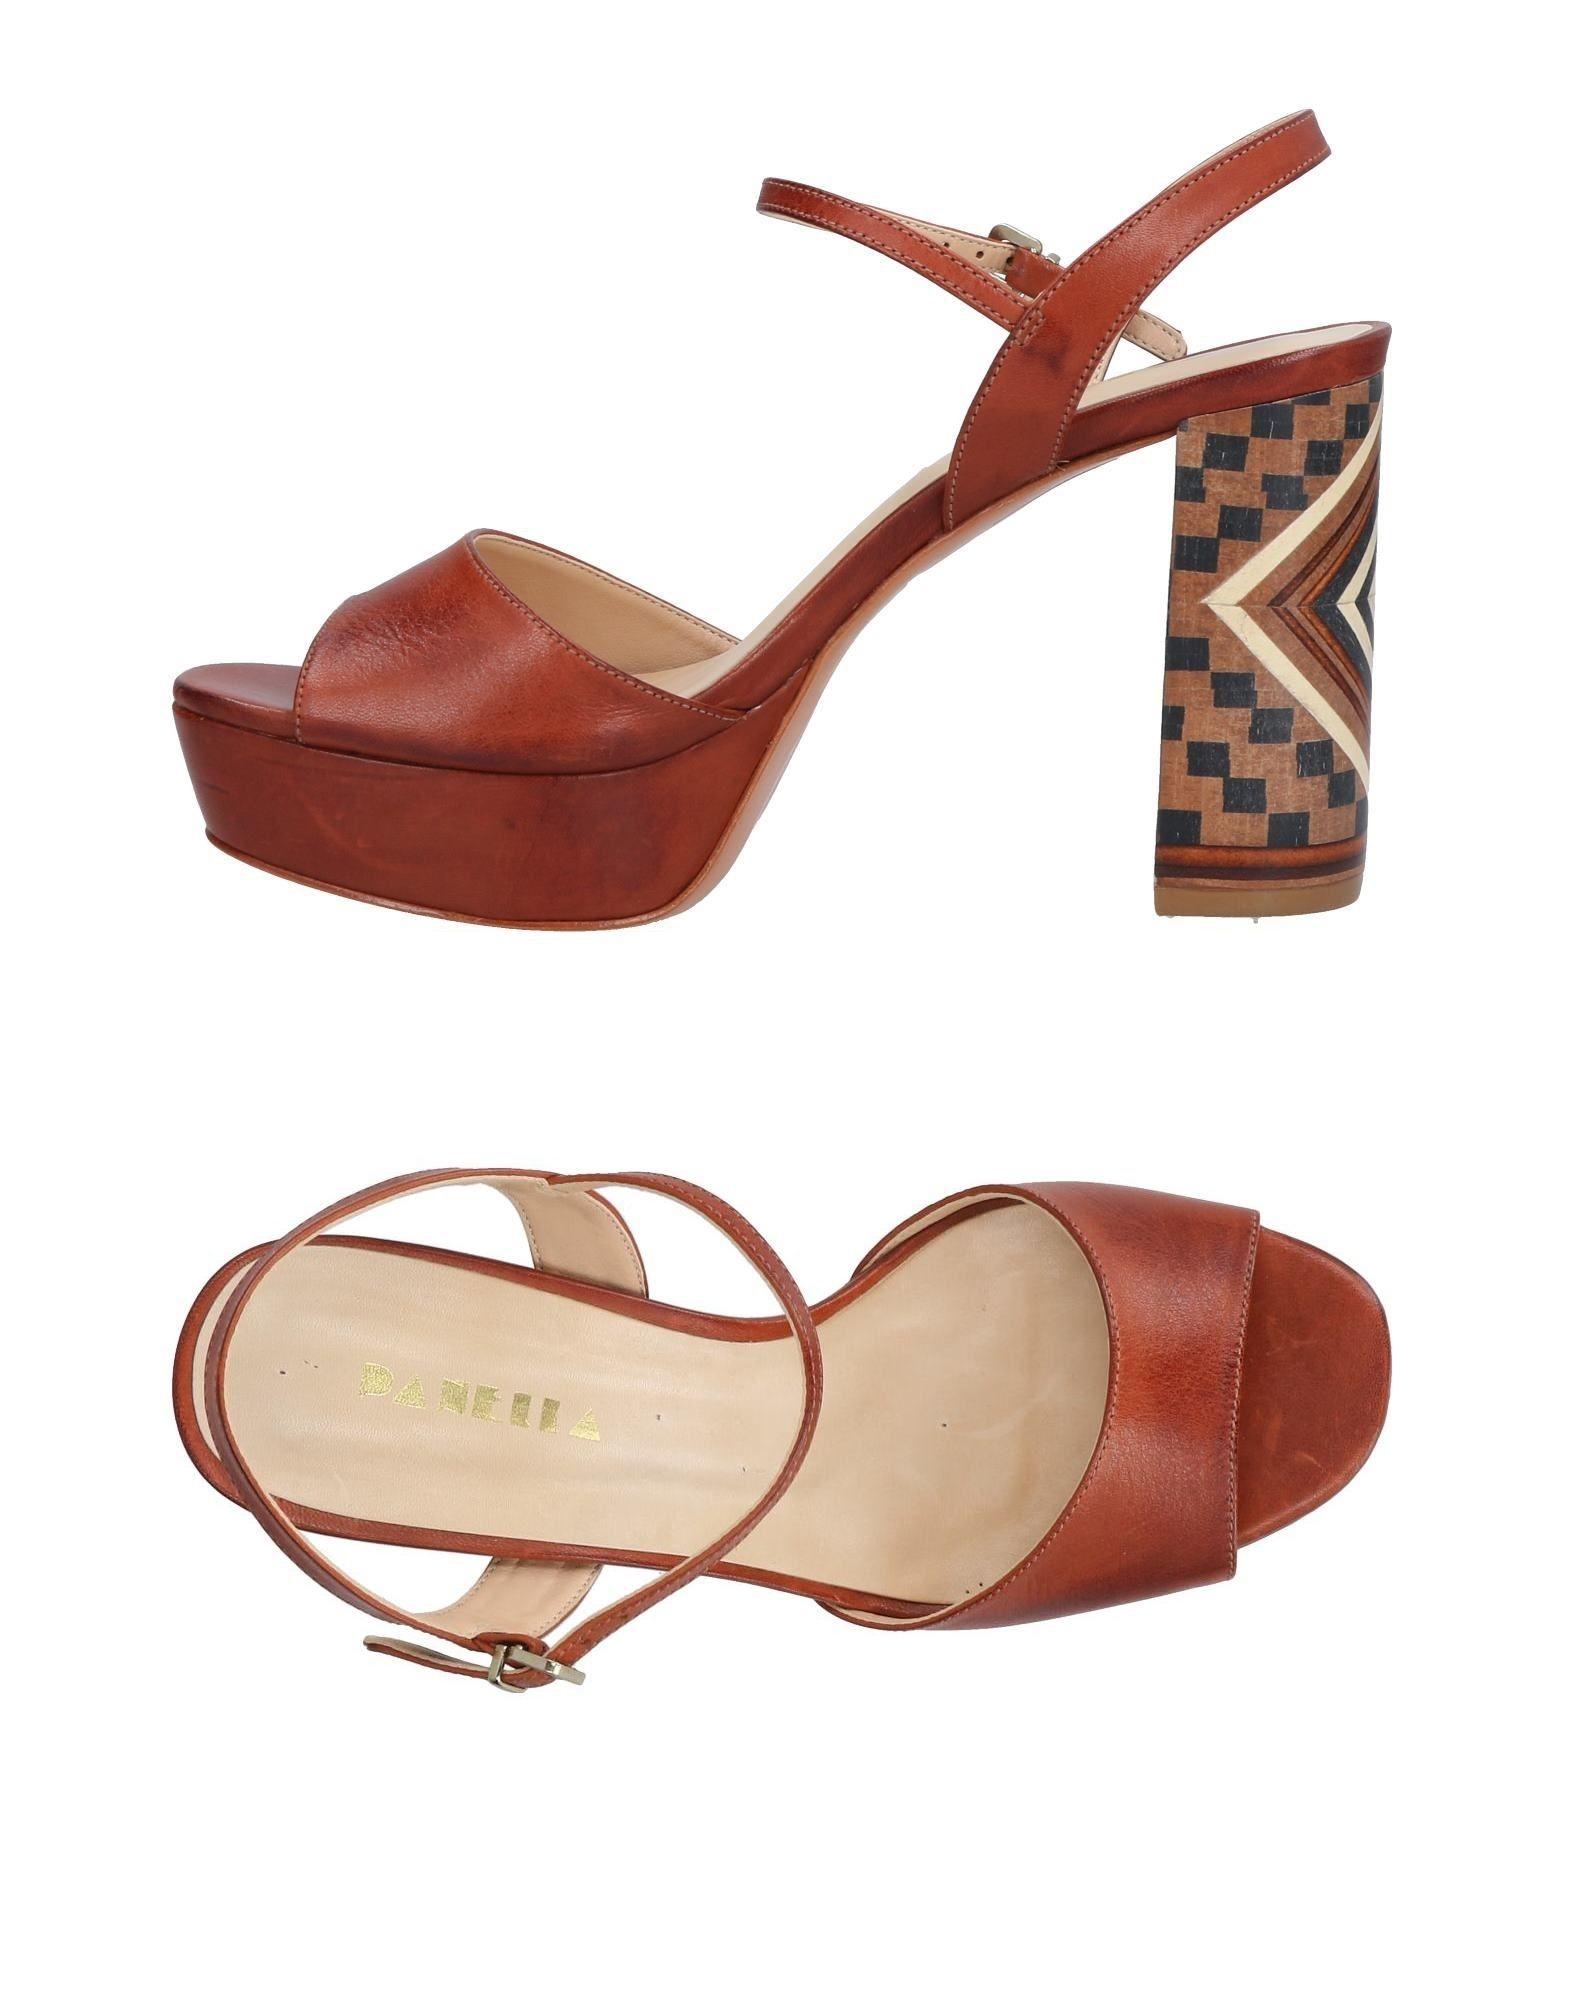 Panella Sandalen Damen  11473876FA Gute Qualität beliebte Schuhe